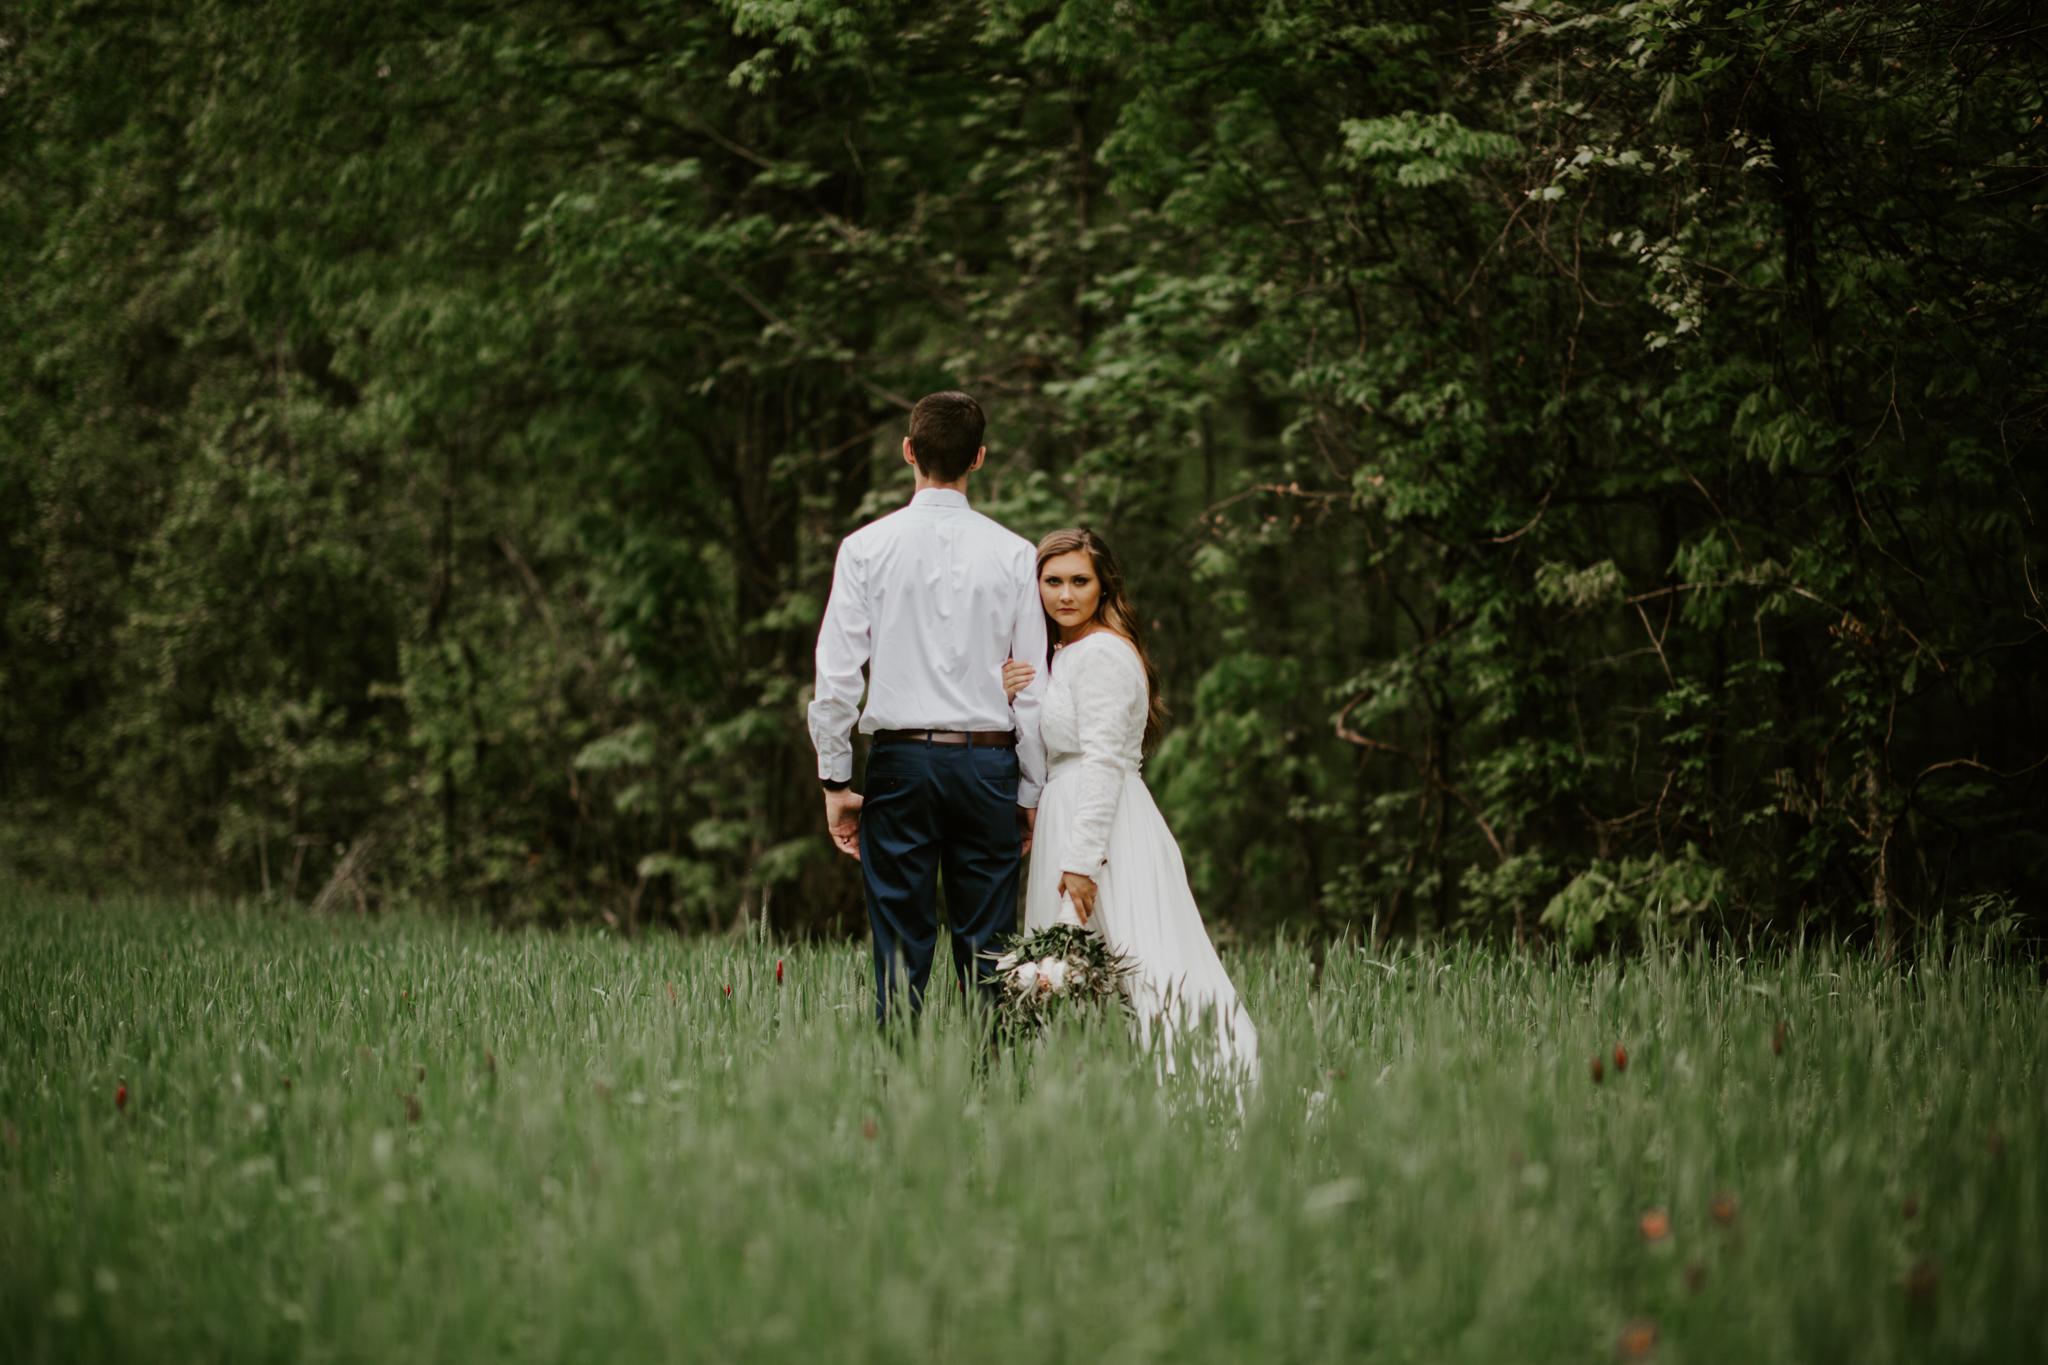 Lacey-Joe-Chattanooga-Nashville-Tennessee-Wedding-Elopement-Photographer-174.jpg